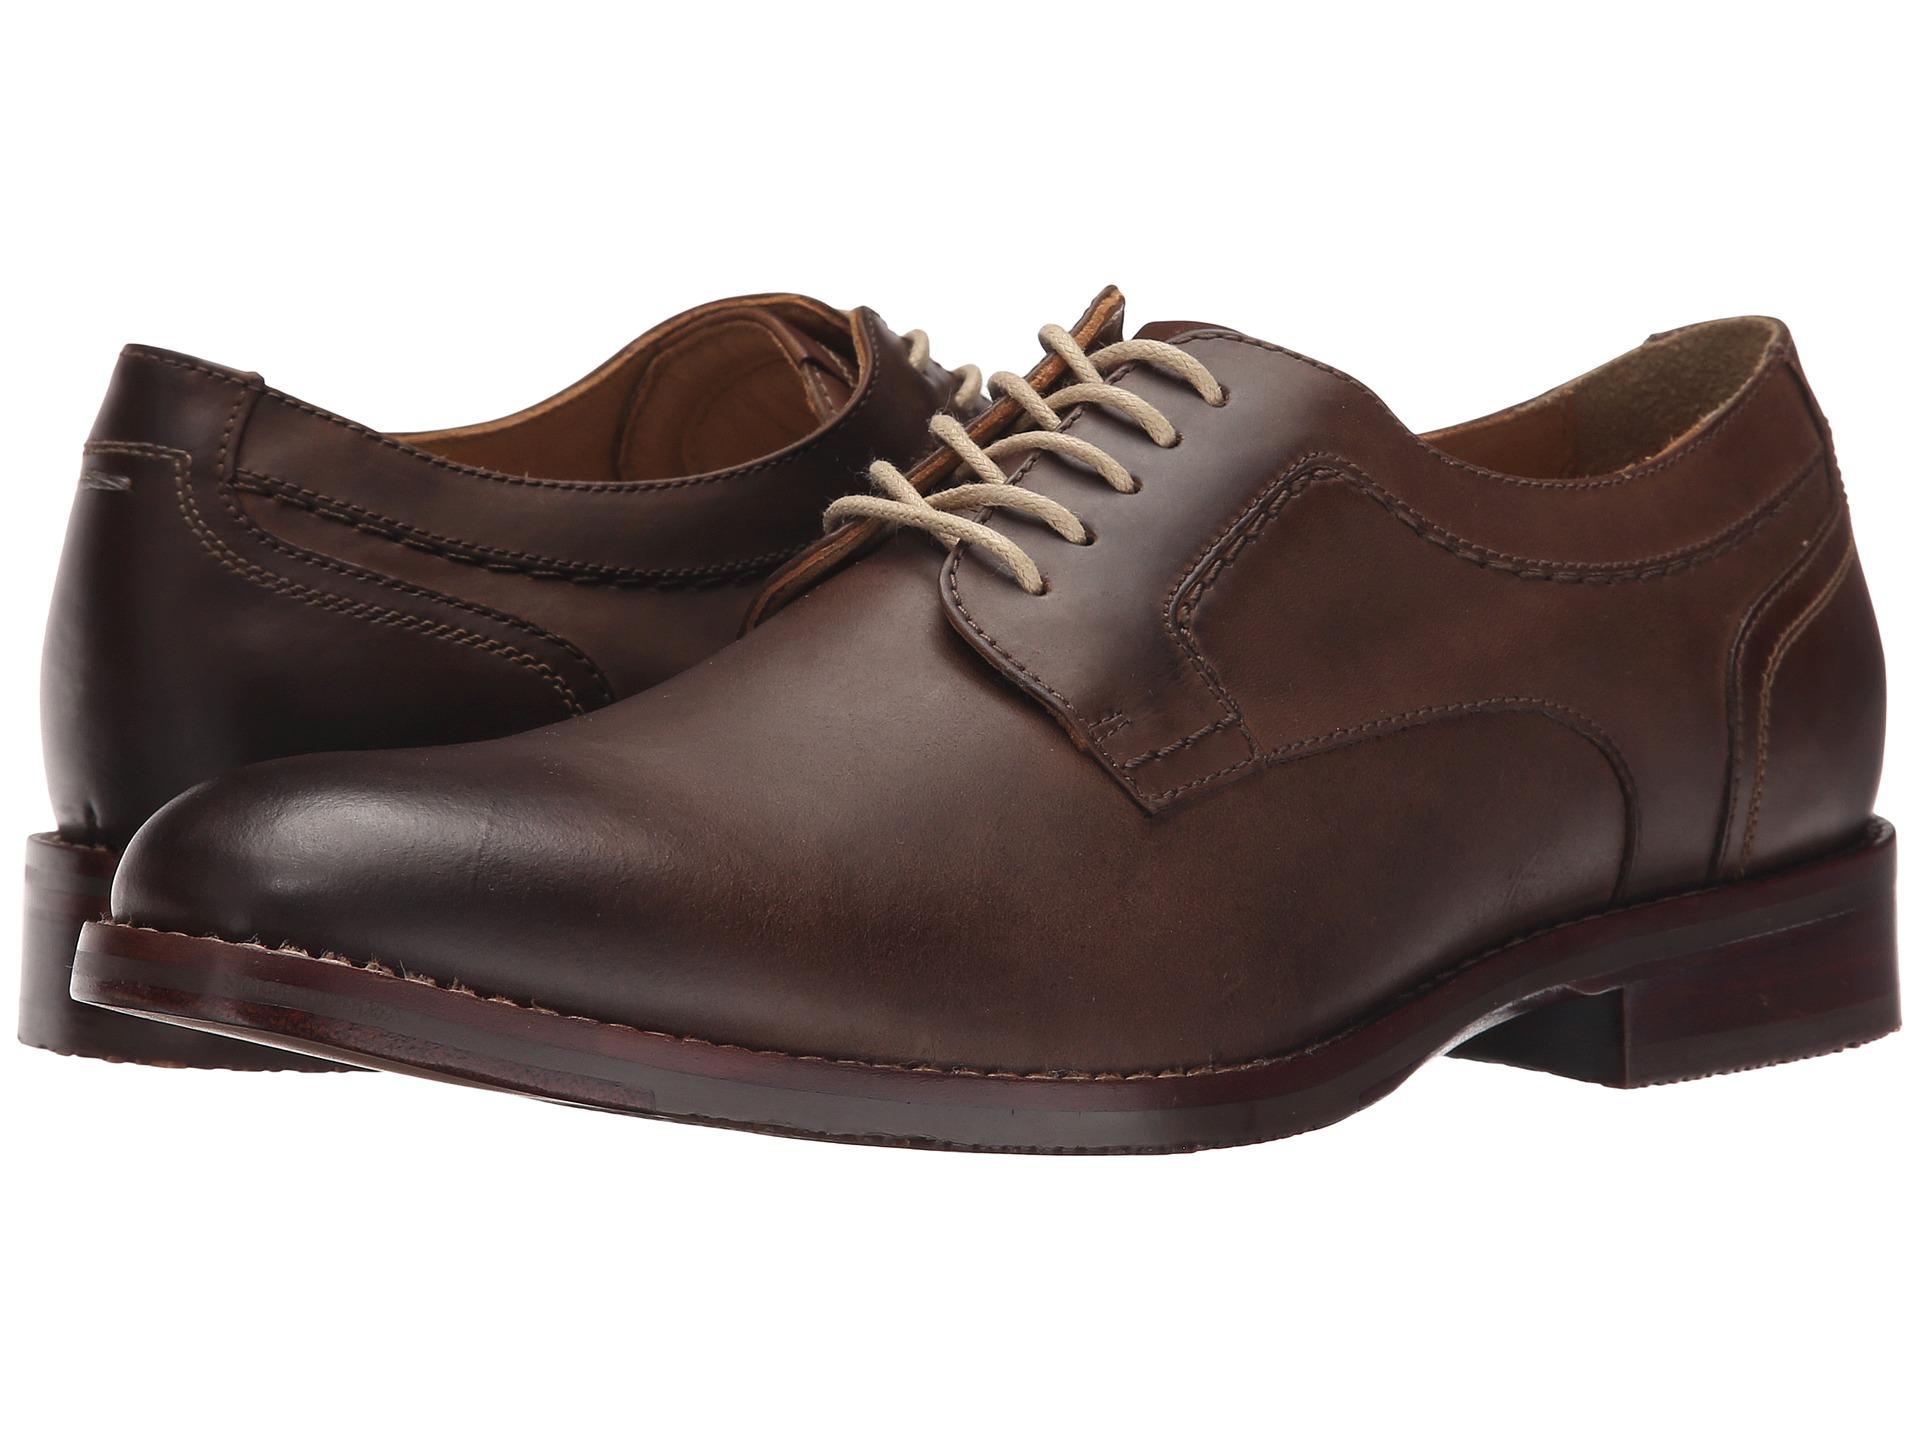 Johnston Murphy Garner Plain Toe Shoes